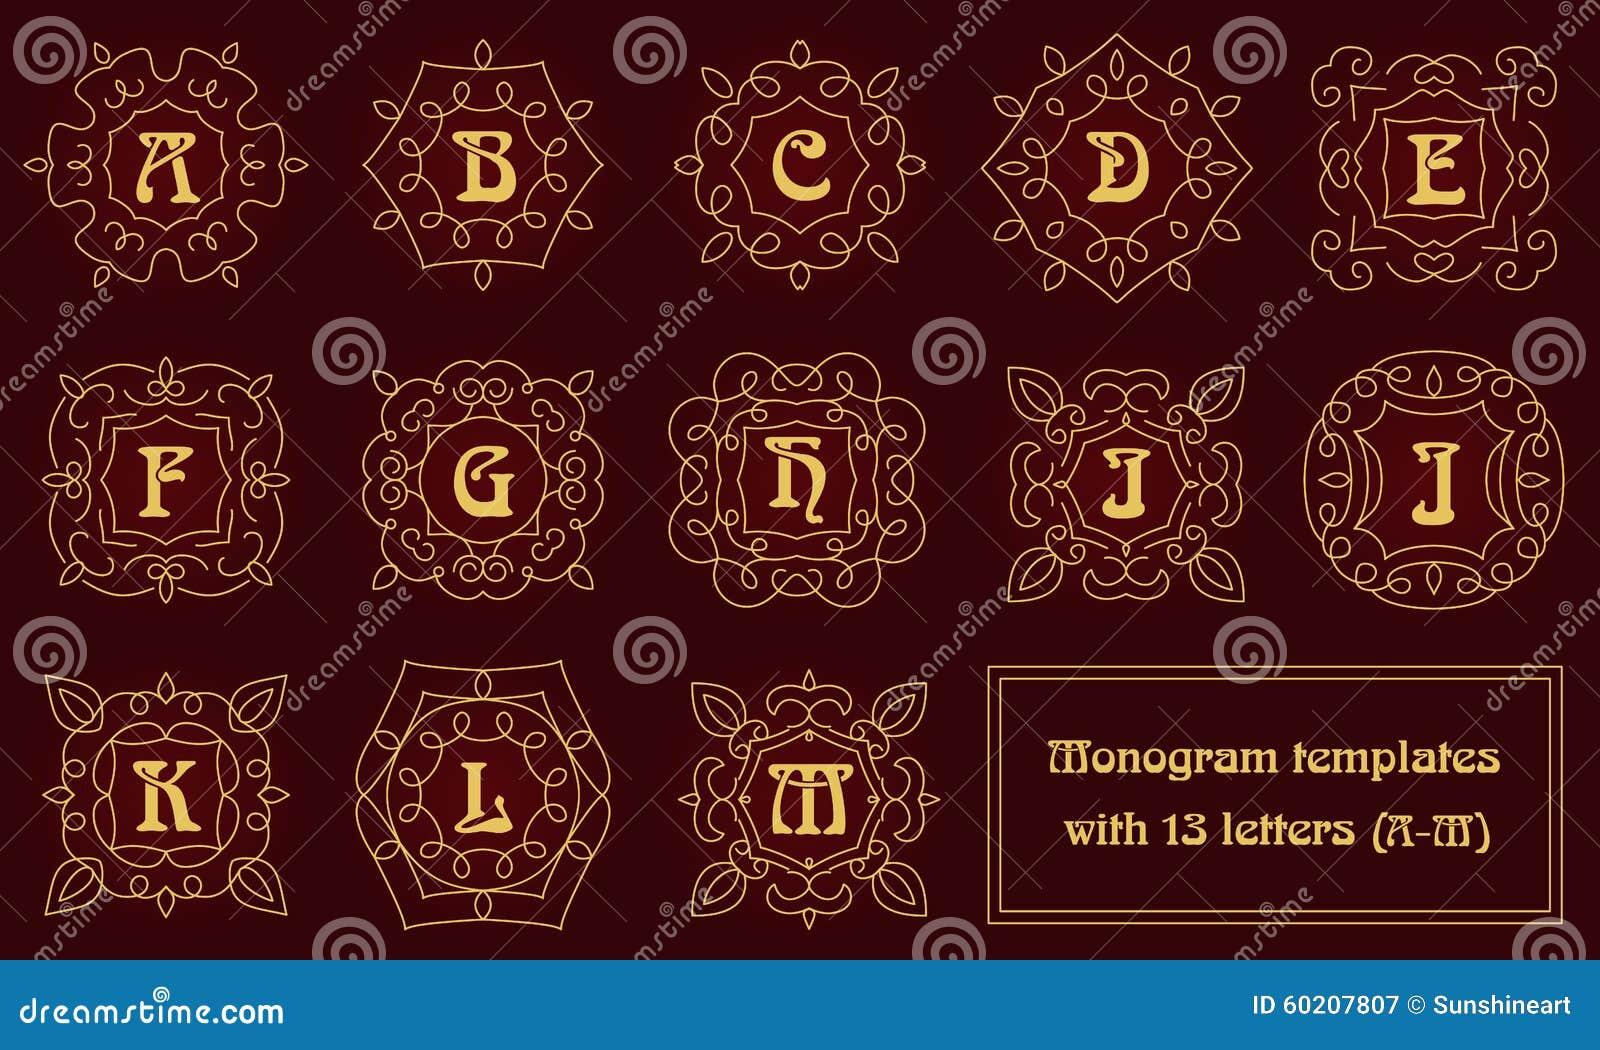 Elegant Monogram Design Templates With Letters. Stock Vector ...